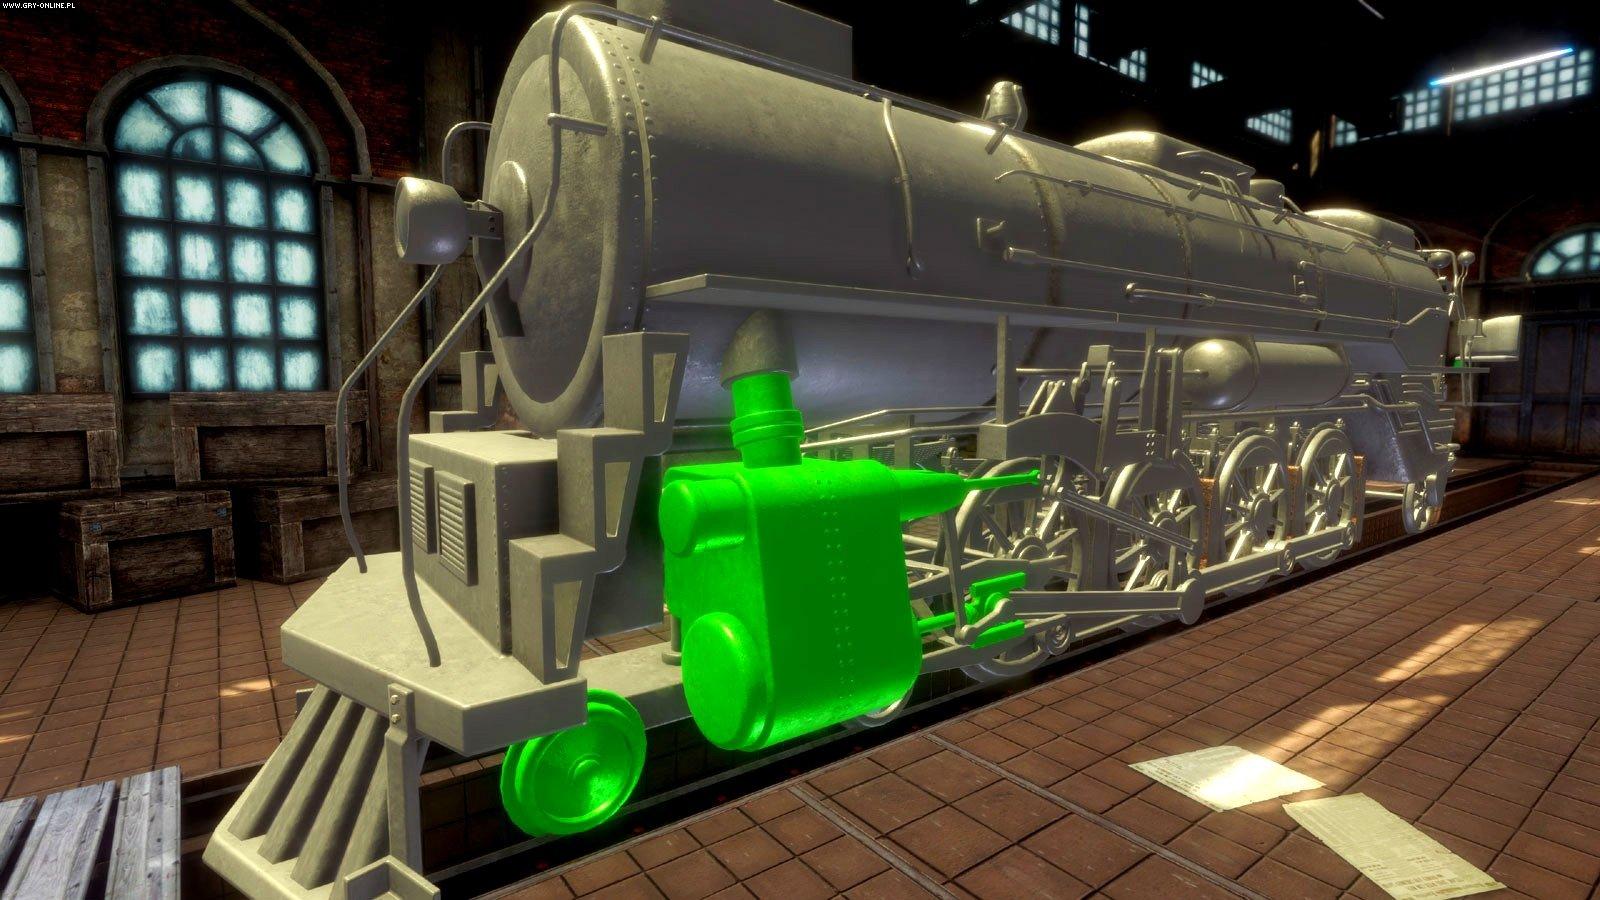 Train Mechanic Simulator 2017 PC Games Image 9/38, Si7 Studio, PlayWay